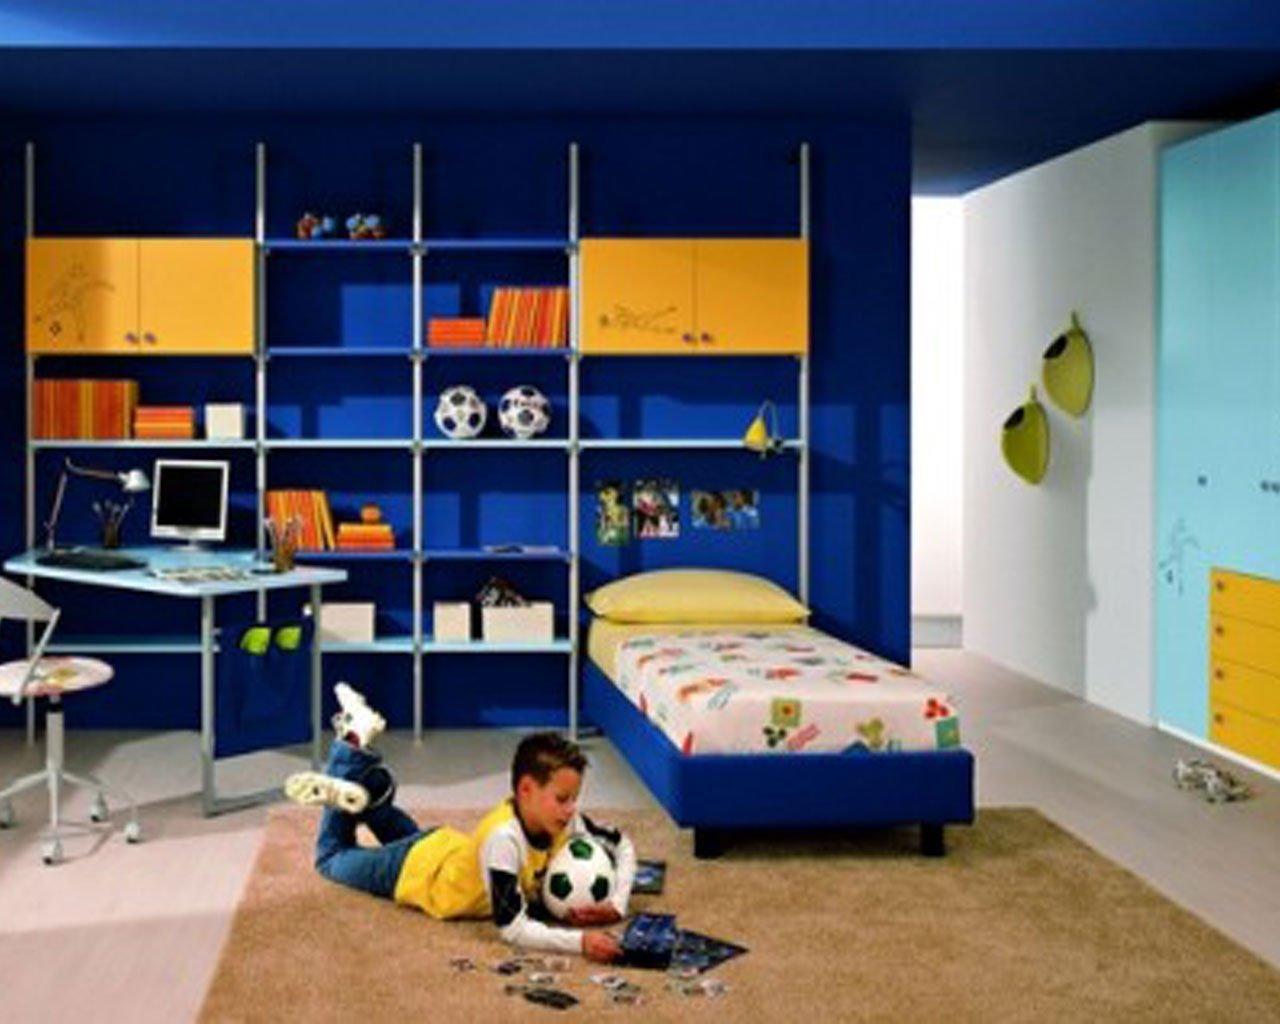 Boys bedroom ideas design wallpaper bedroom designs for children 2013 1280x1024